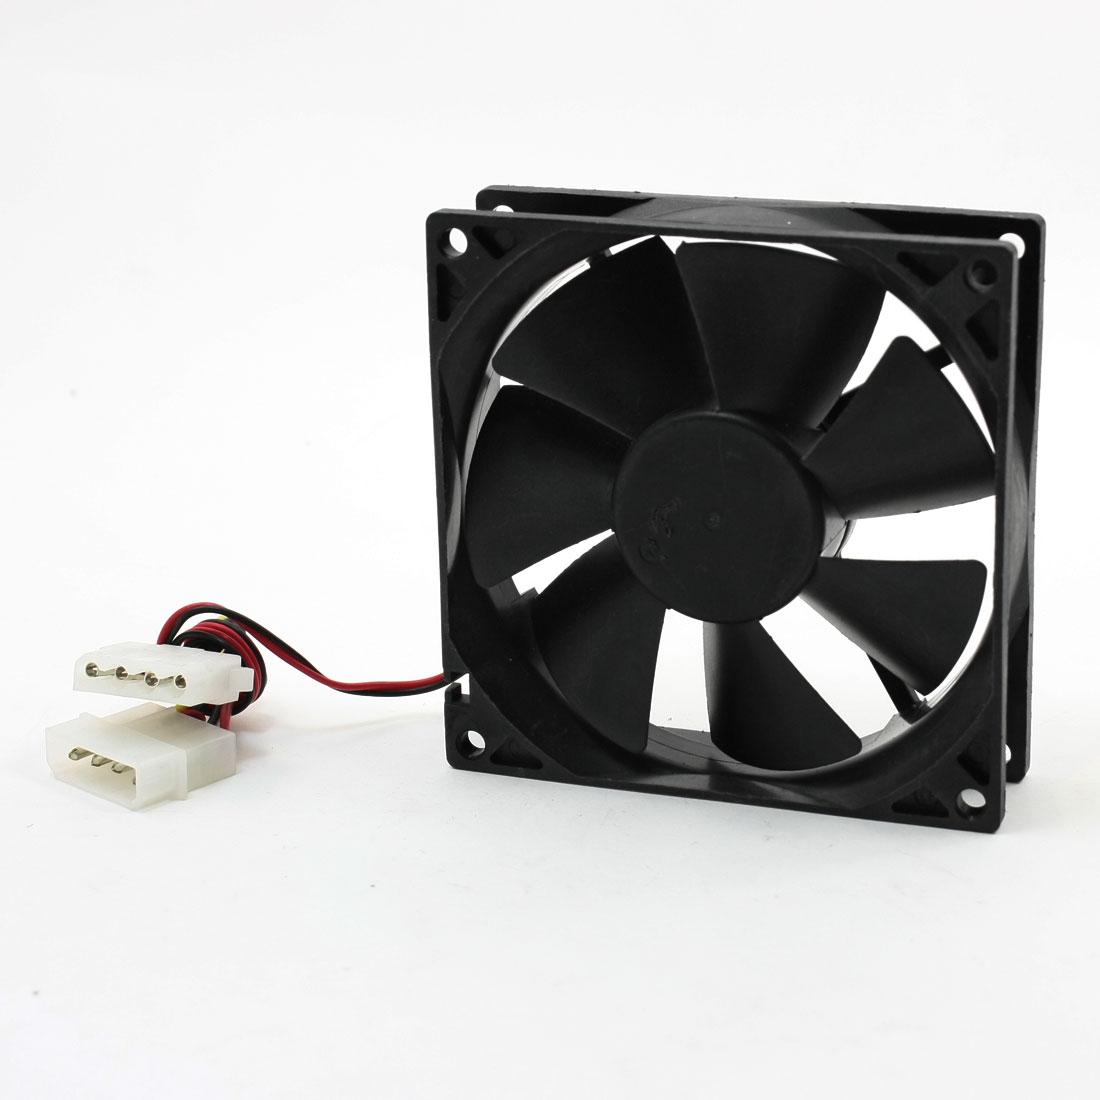 92mm x 92mm x 25mm DC 12V 4Pin Computer CPU Cooler Cooling Fan Black